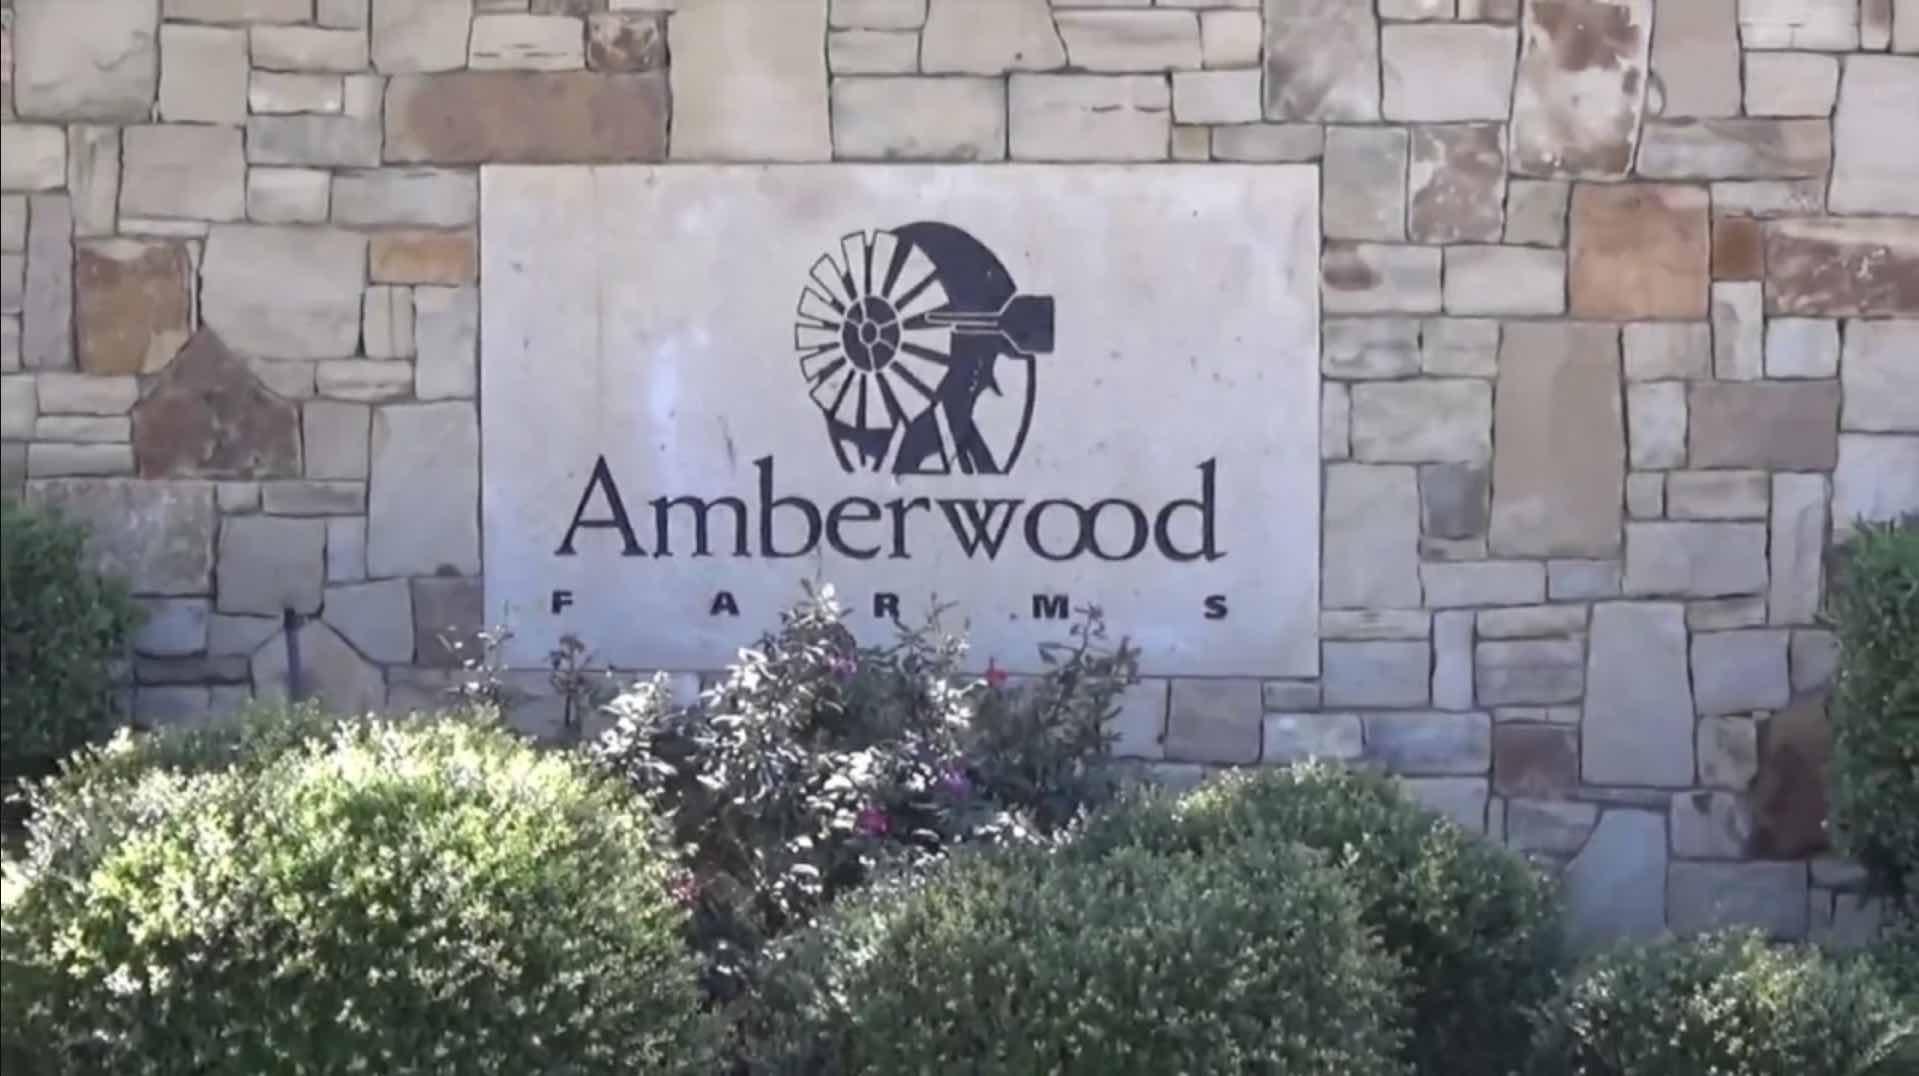 Amberwood Farms Homes For Sale in Prosper Tx